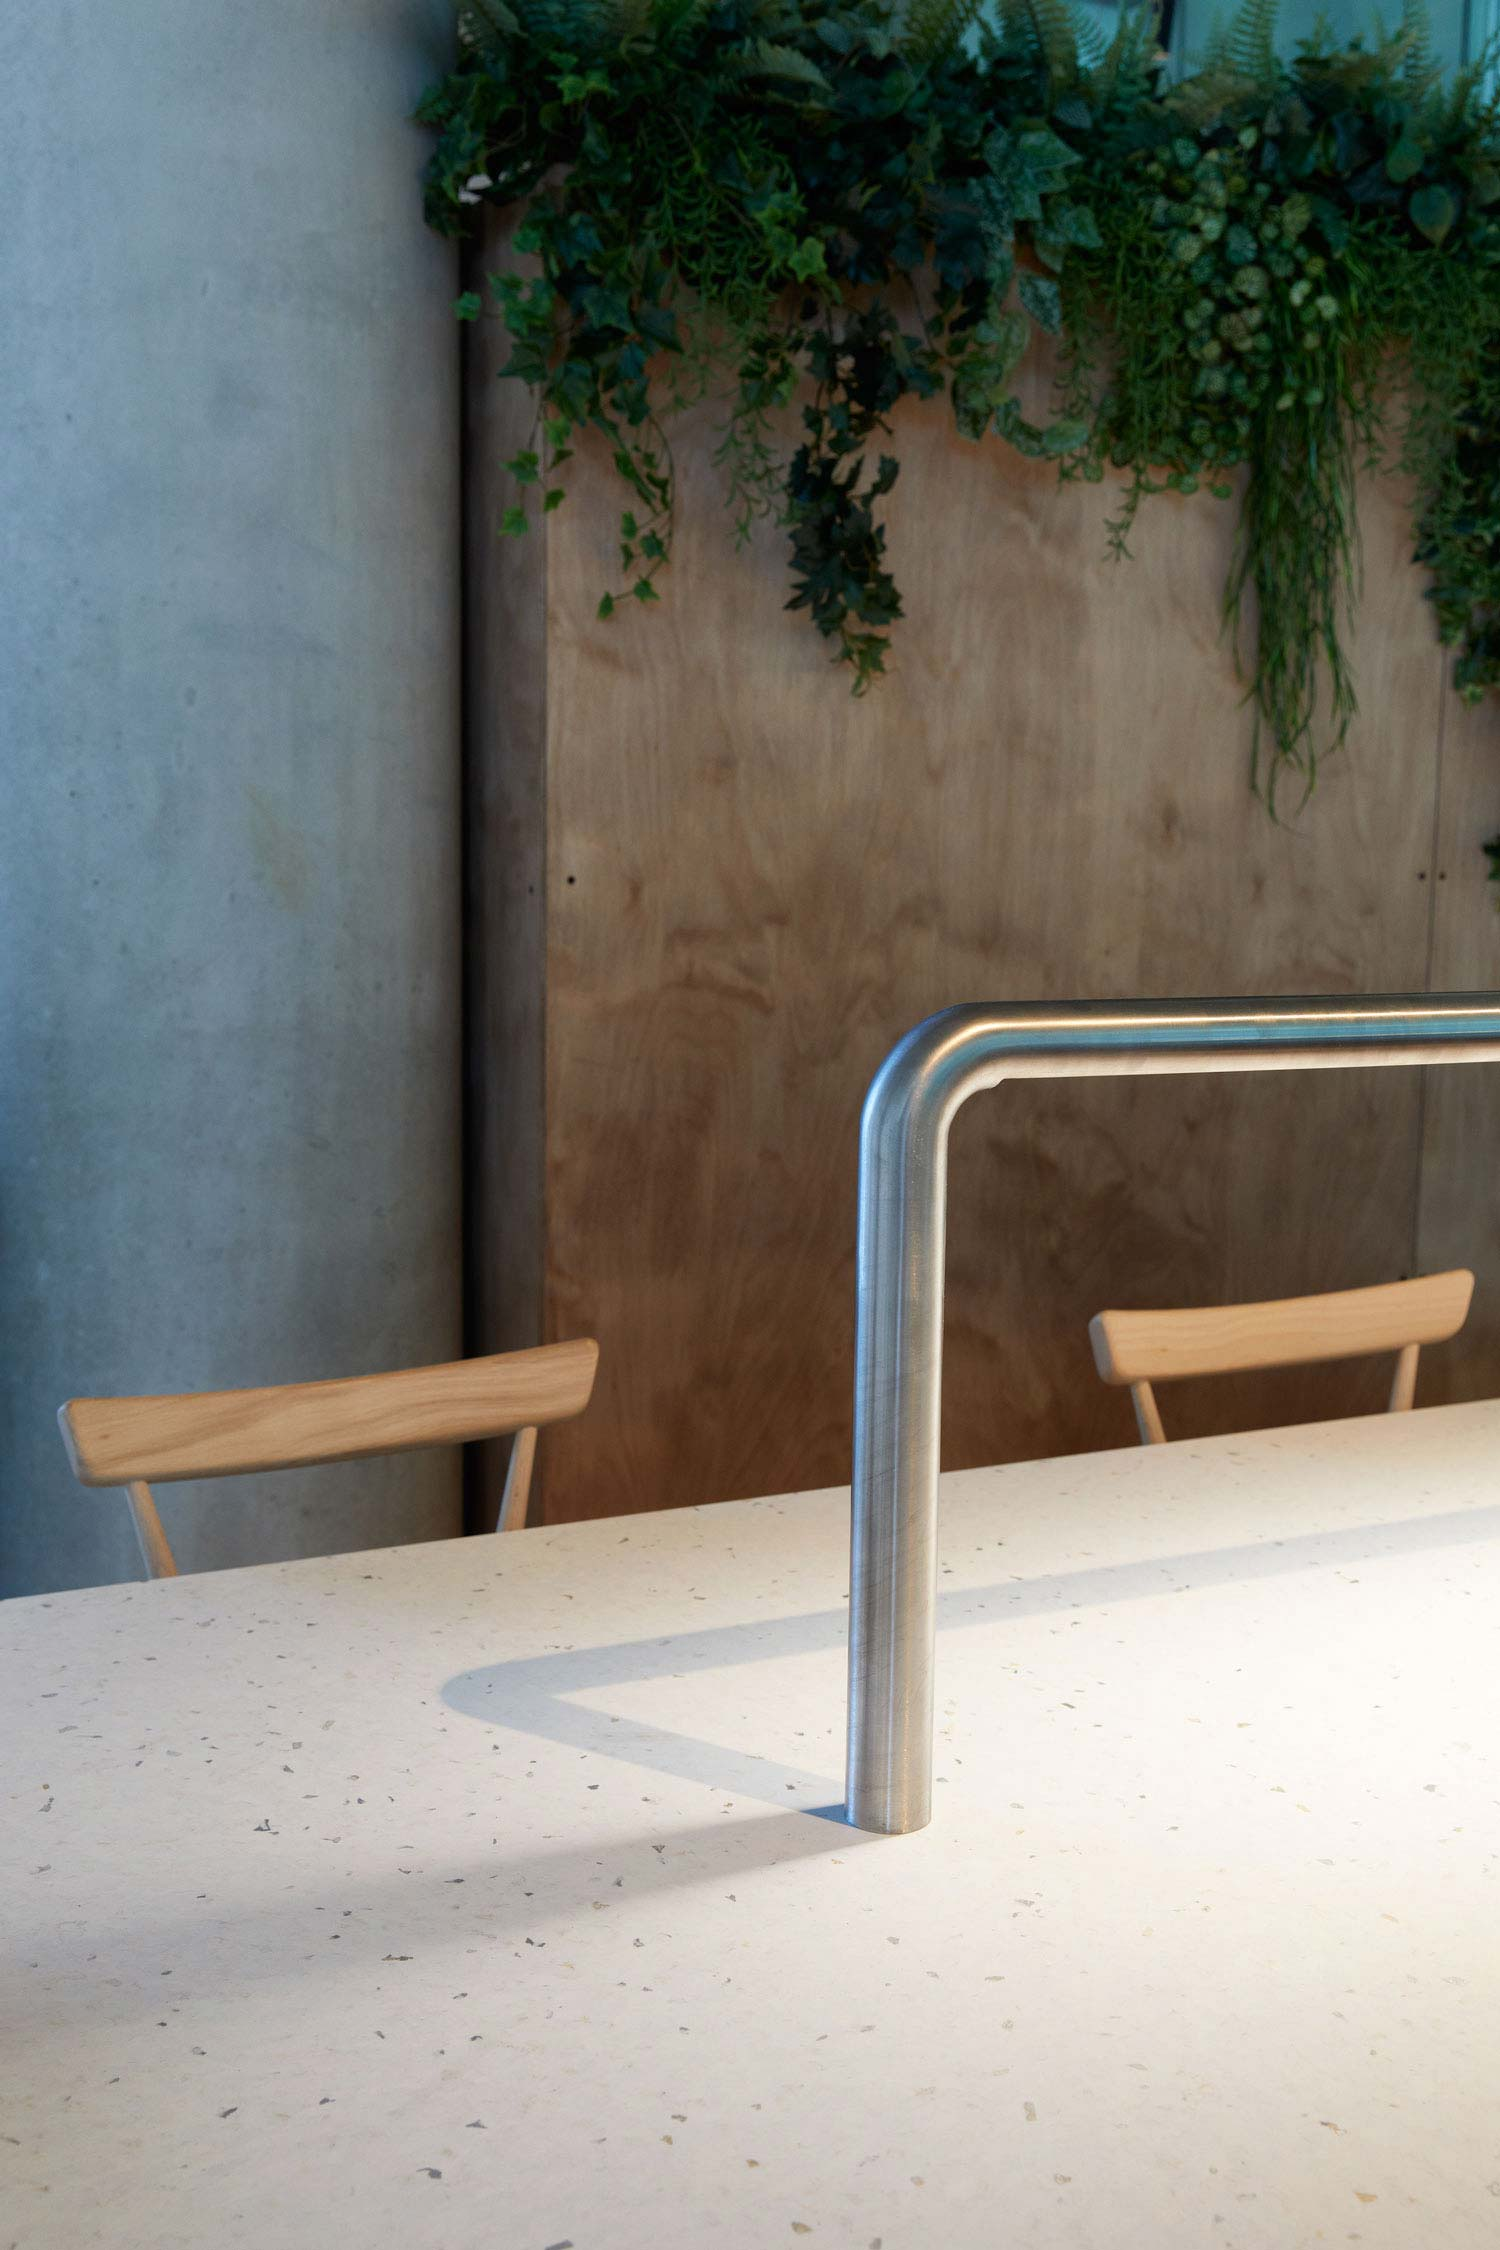 Architecture-London-Design-Freehaus-Workspace-Imperial-College-2.jpg